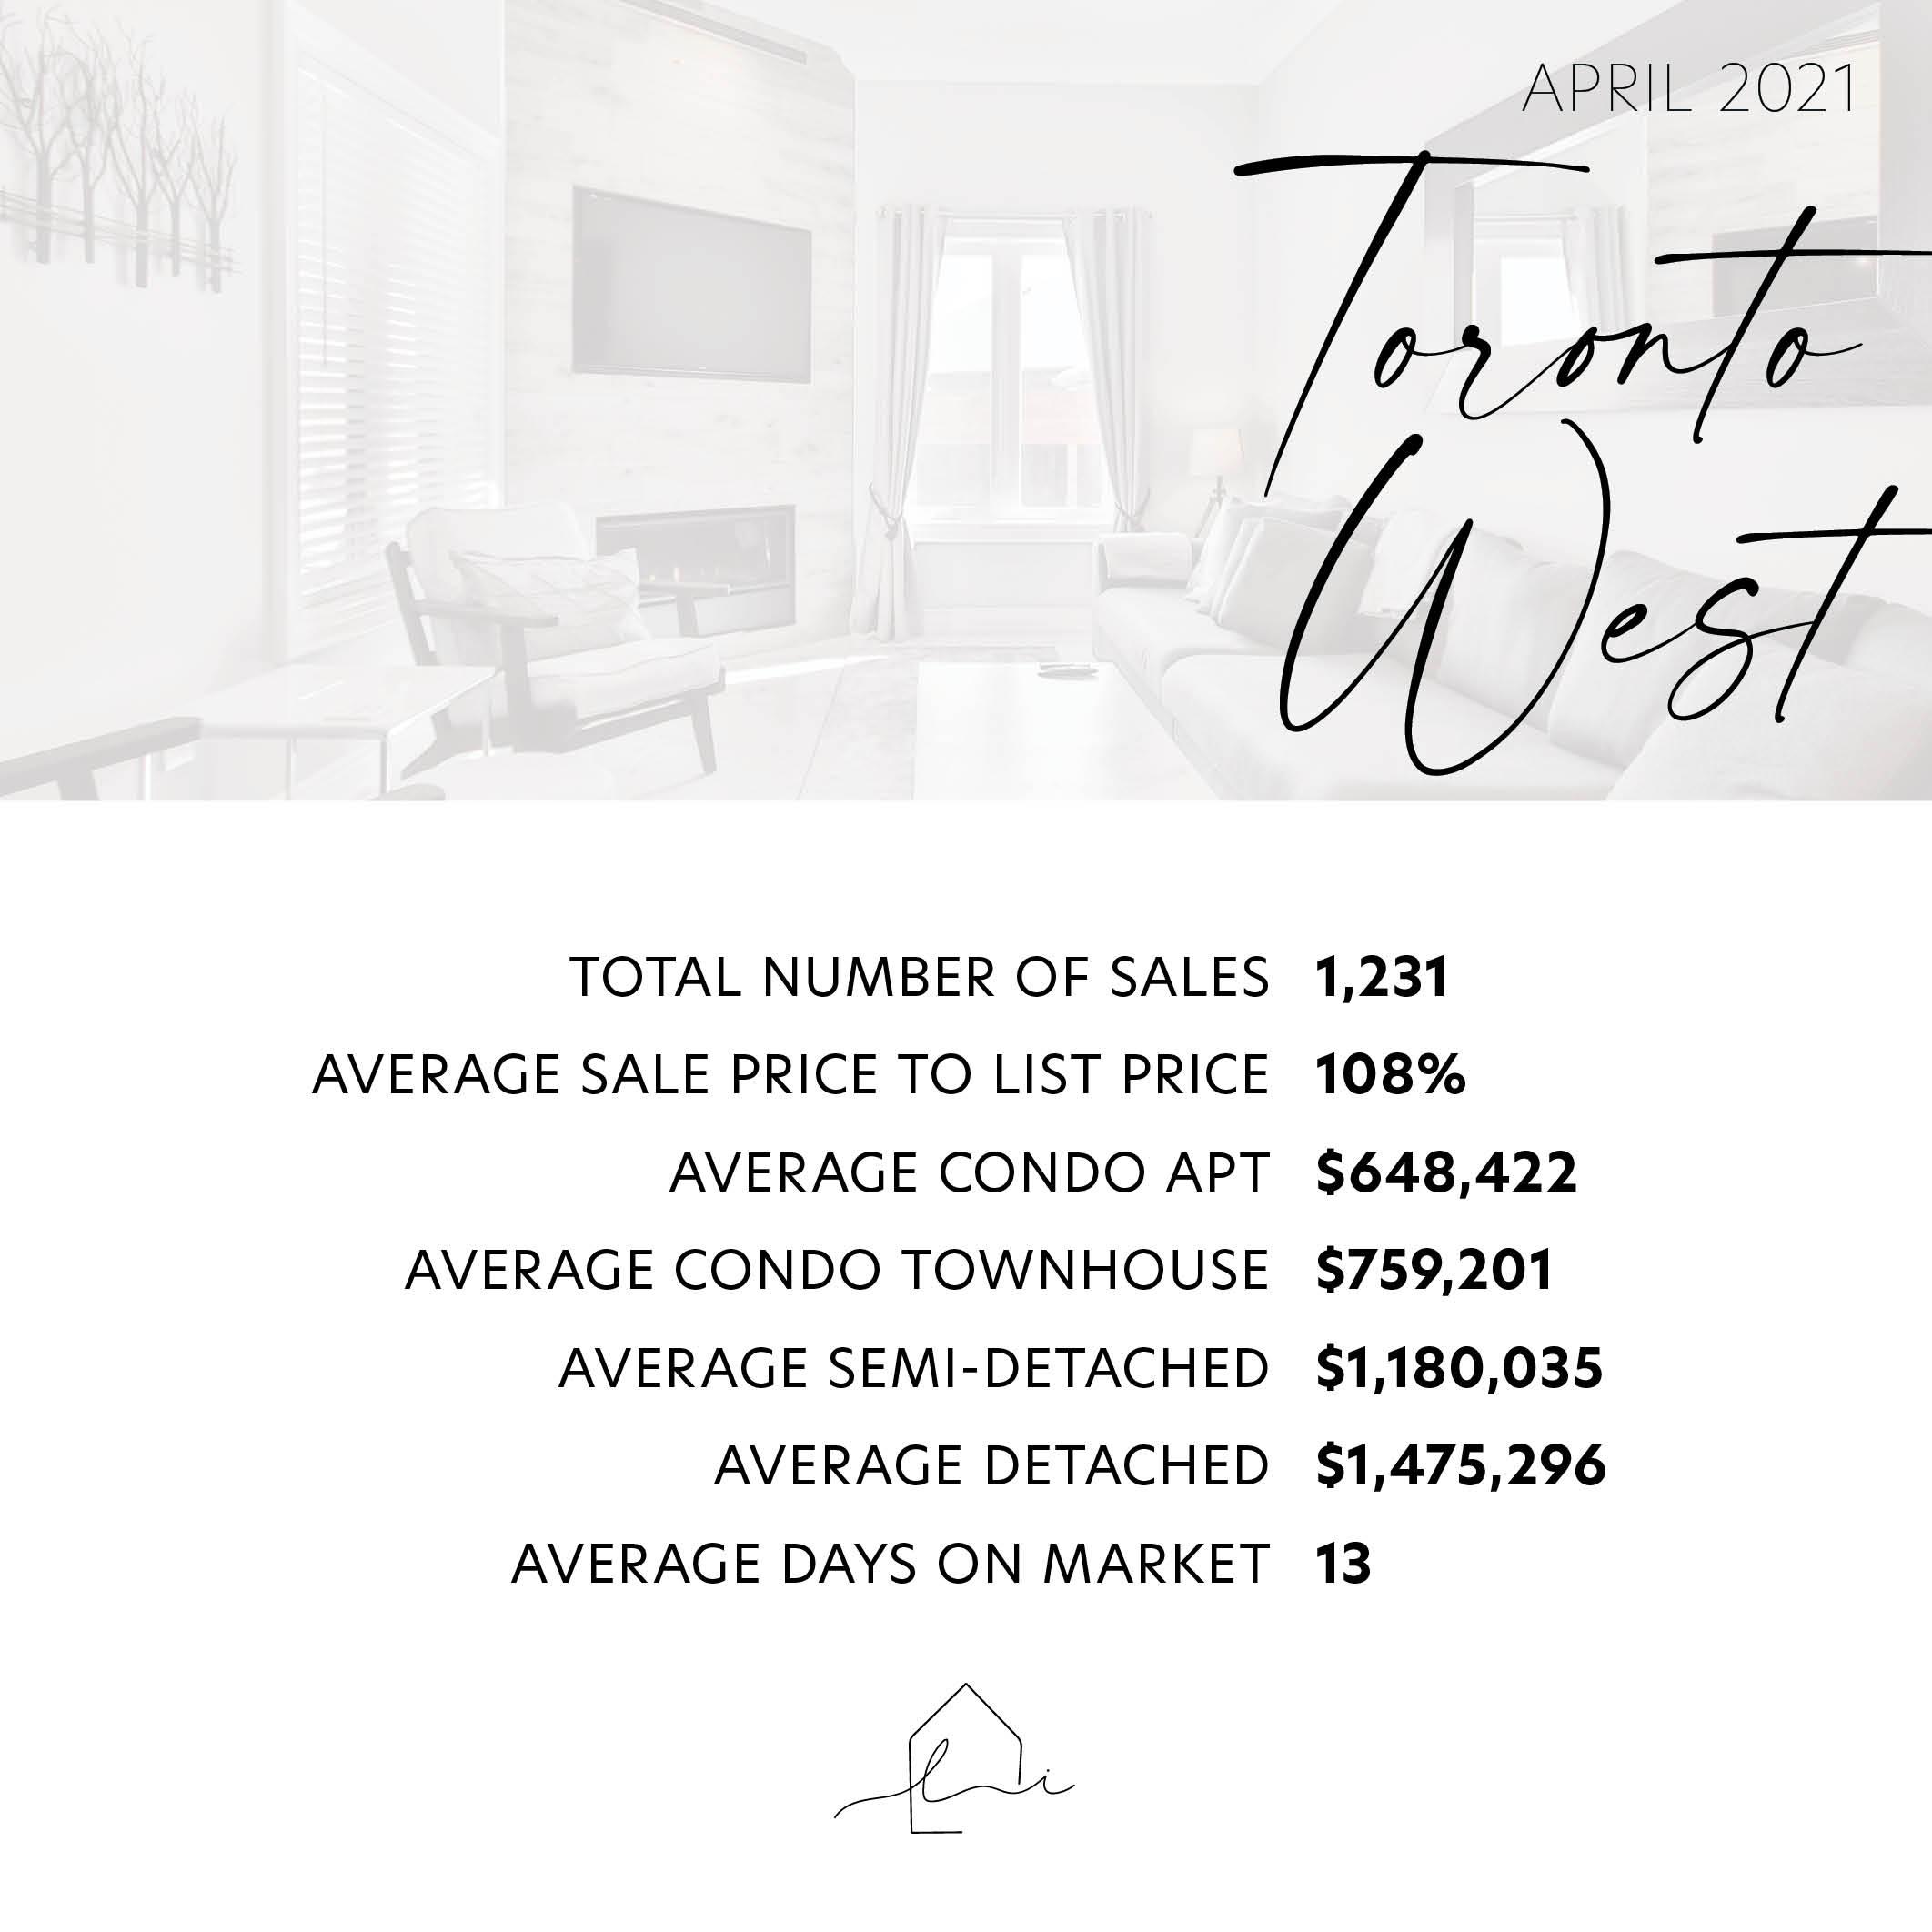 Toronto West April 2021 Statistics - Lara Stasiw Real Estate